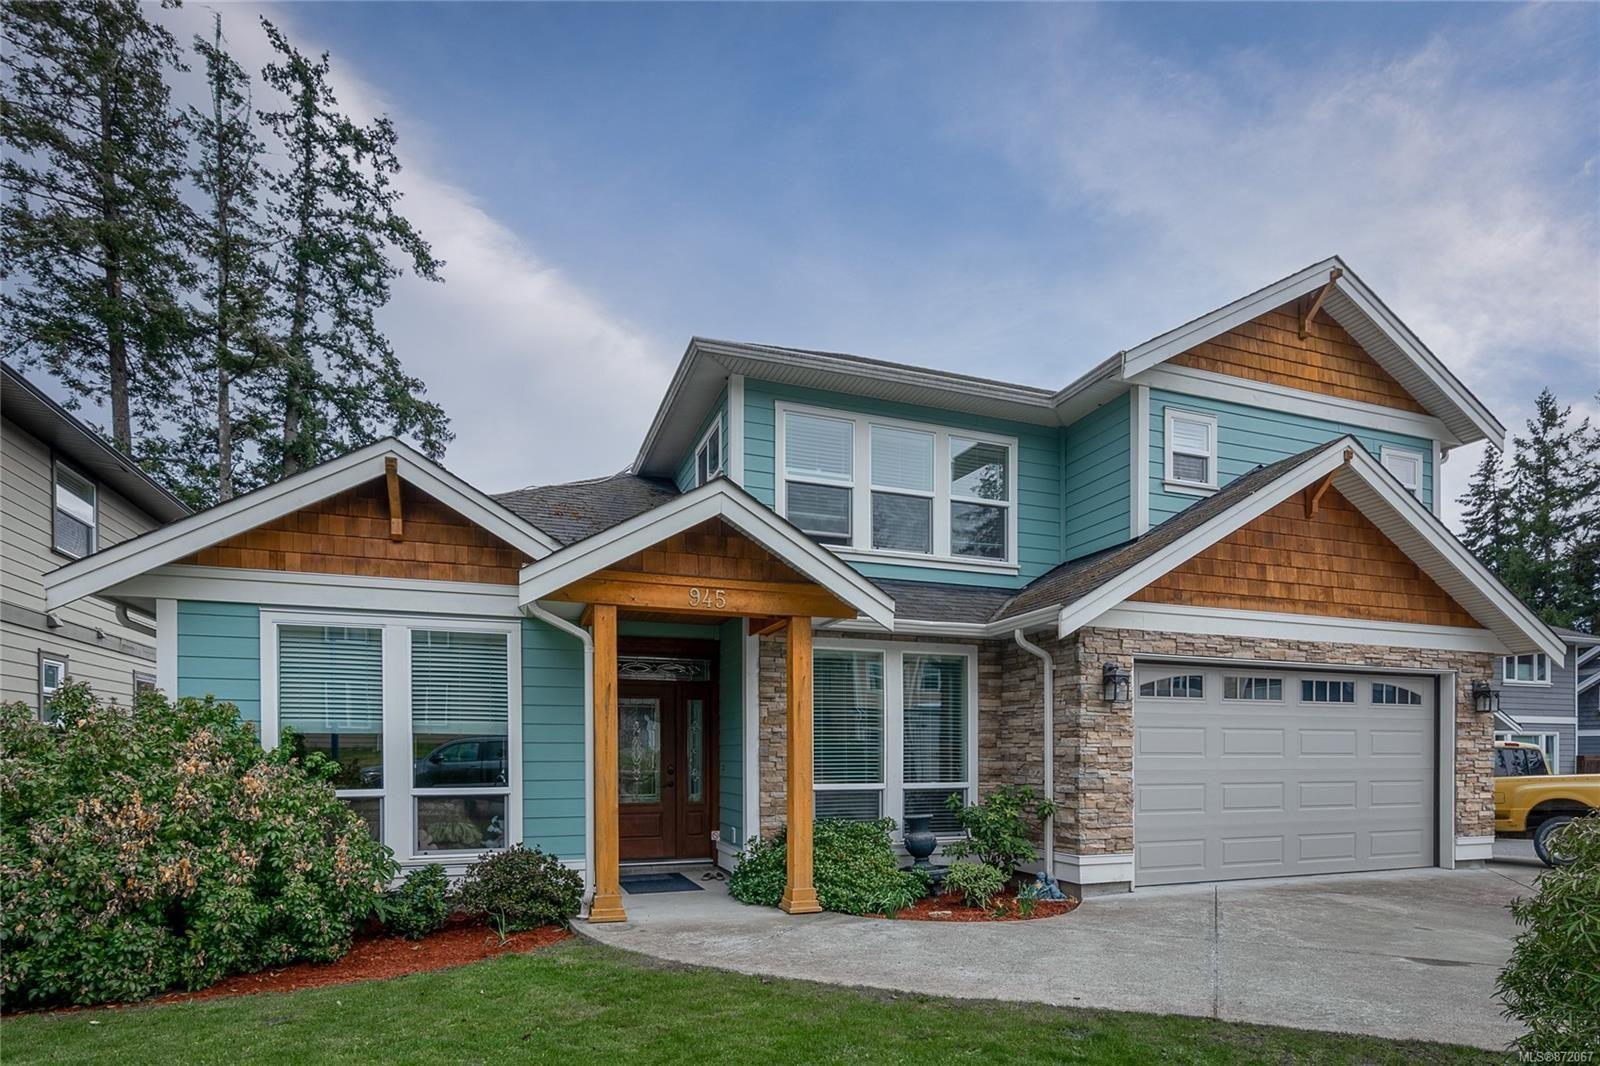 Main Photo: 945 Aqua Crt in : La Florence Lake House for sale (Langford)  : MLS®# 872067